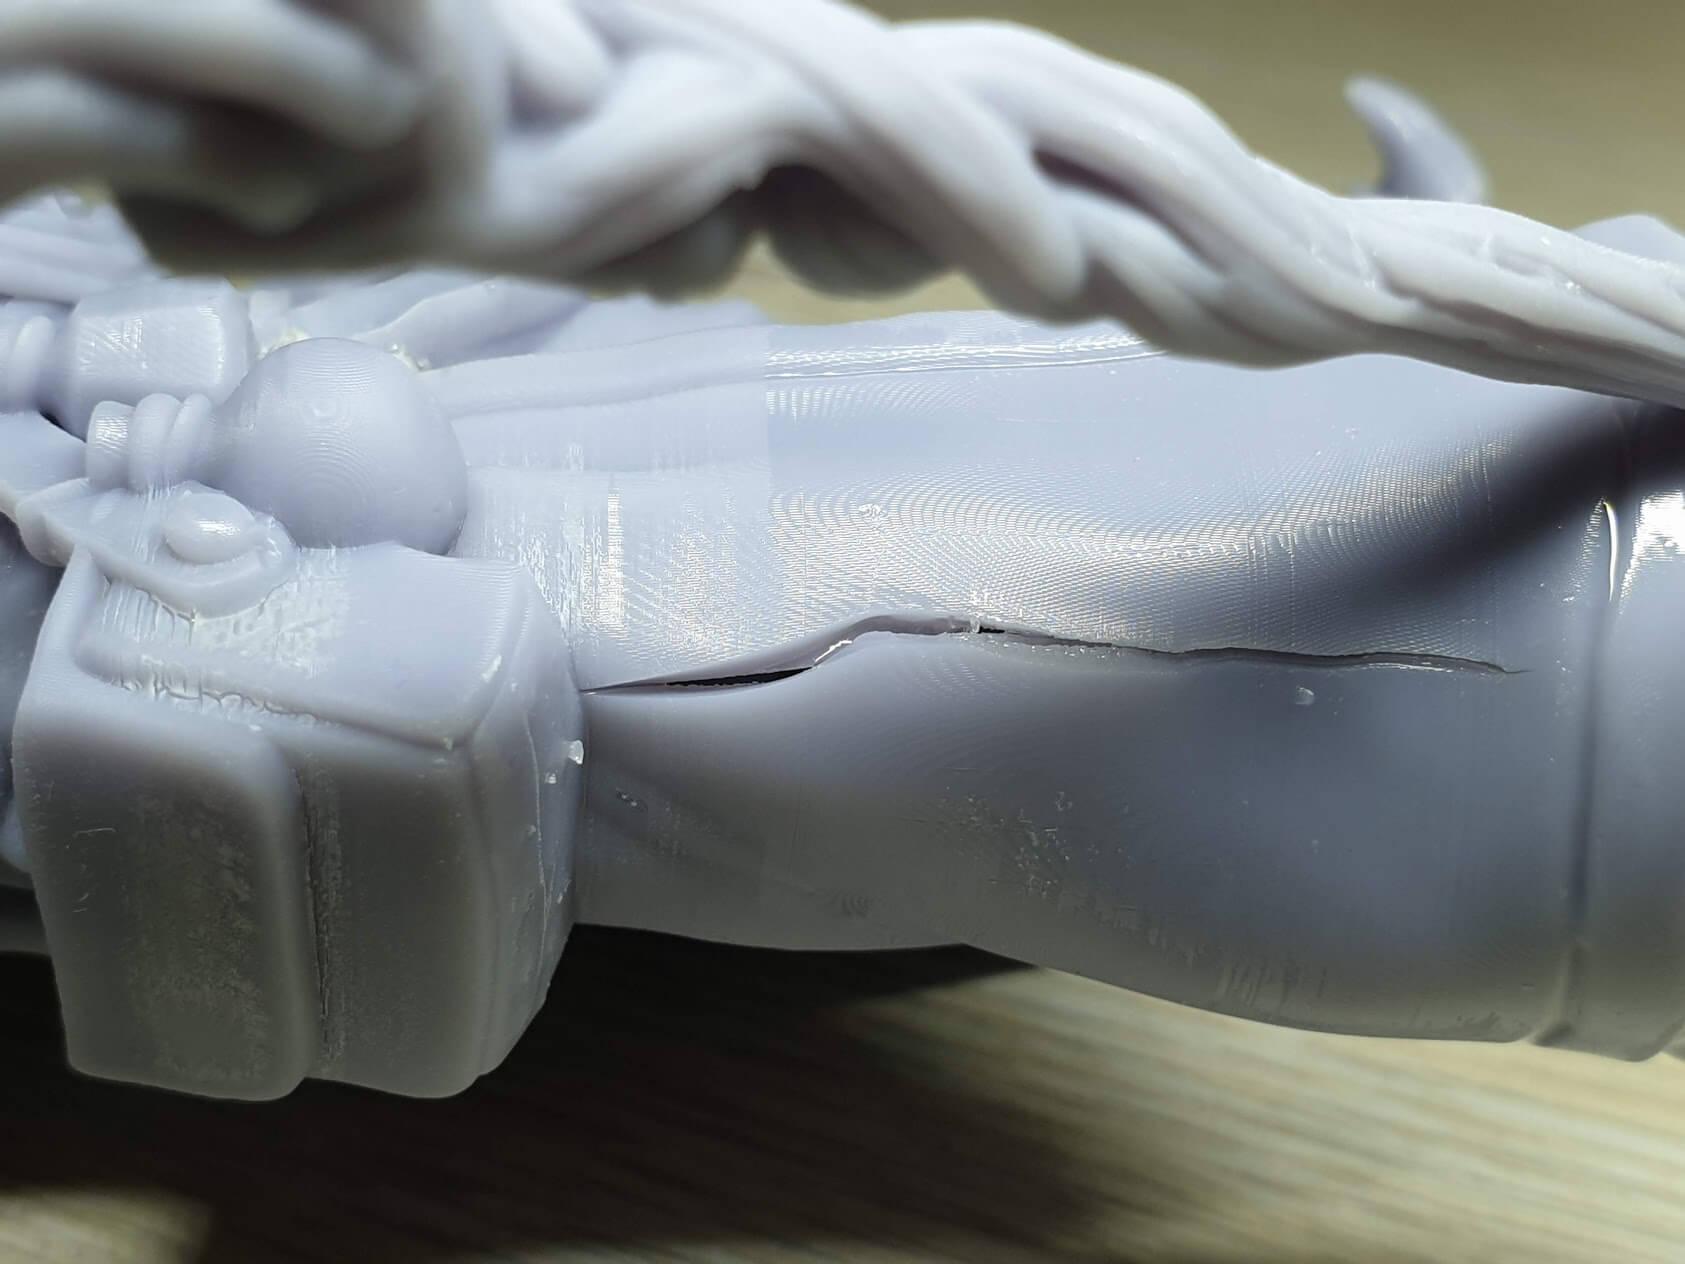 Elegoo Water Washable Resin cracks after print 1 | ELEGOO Water Washable Resin Review